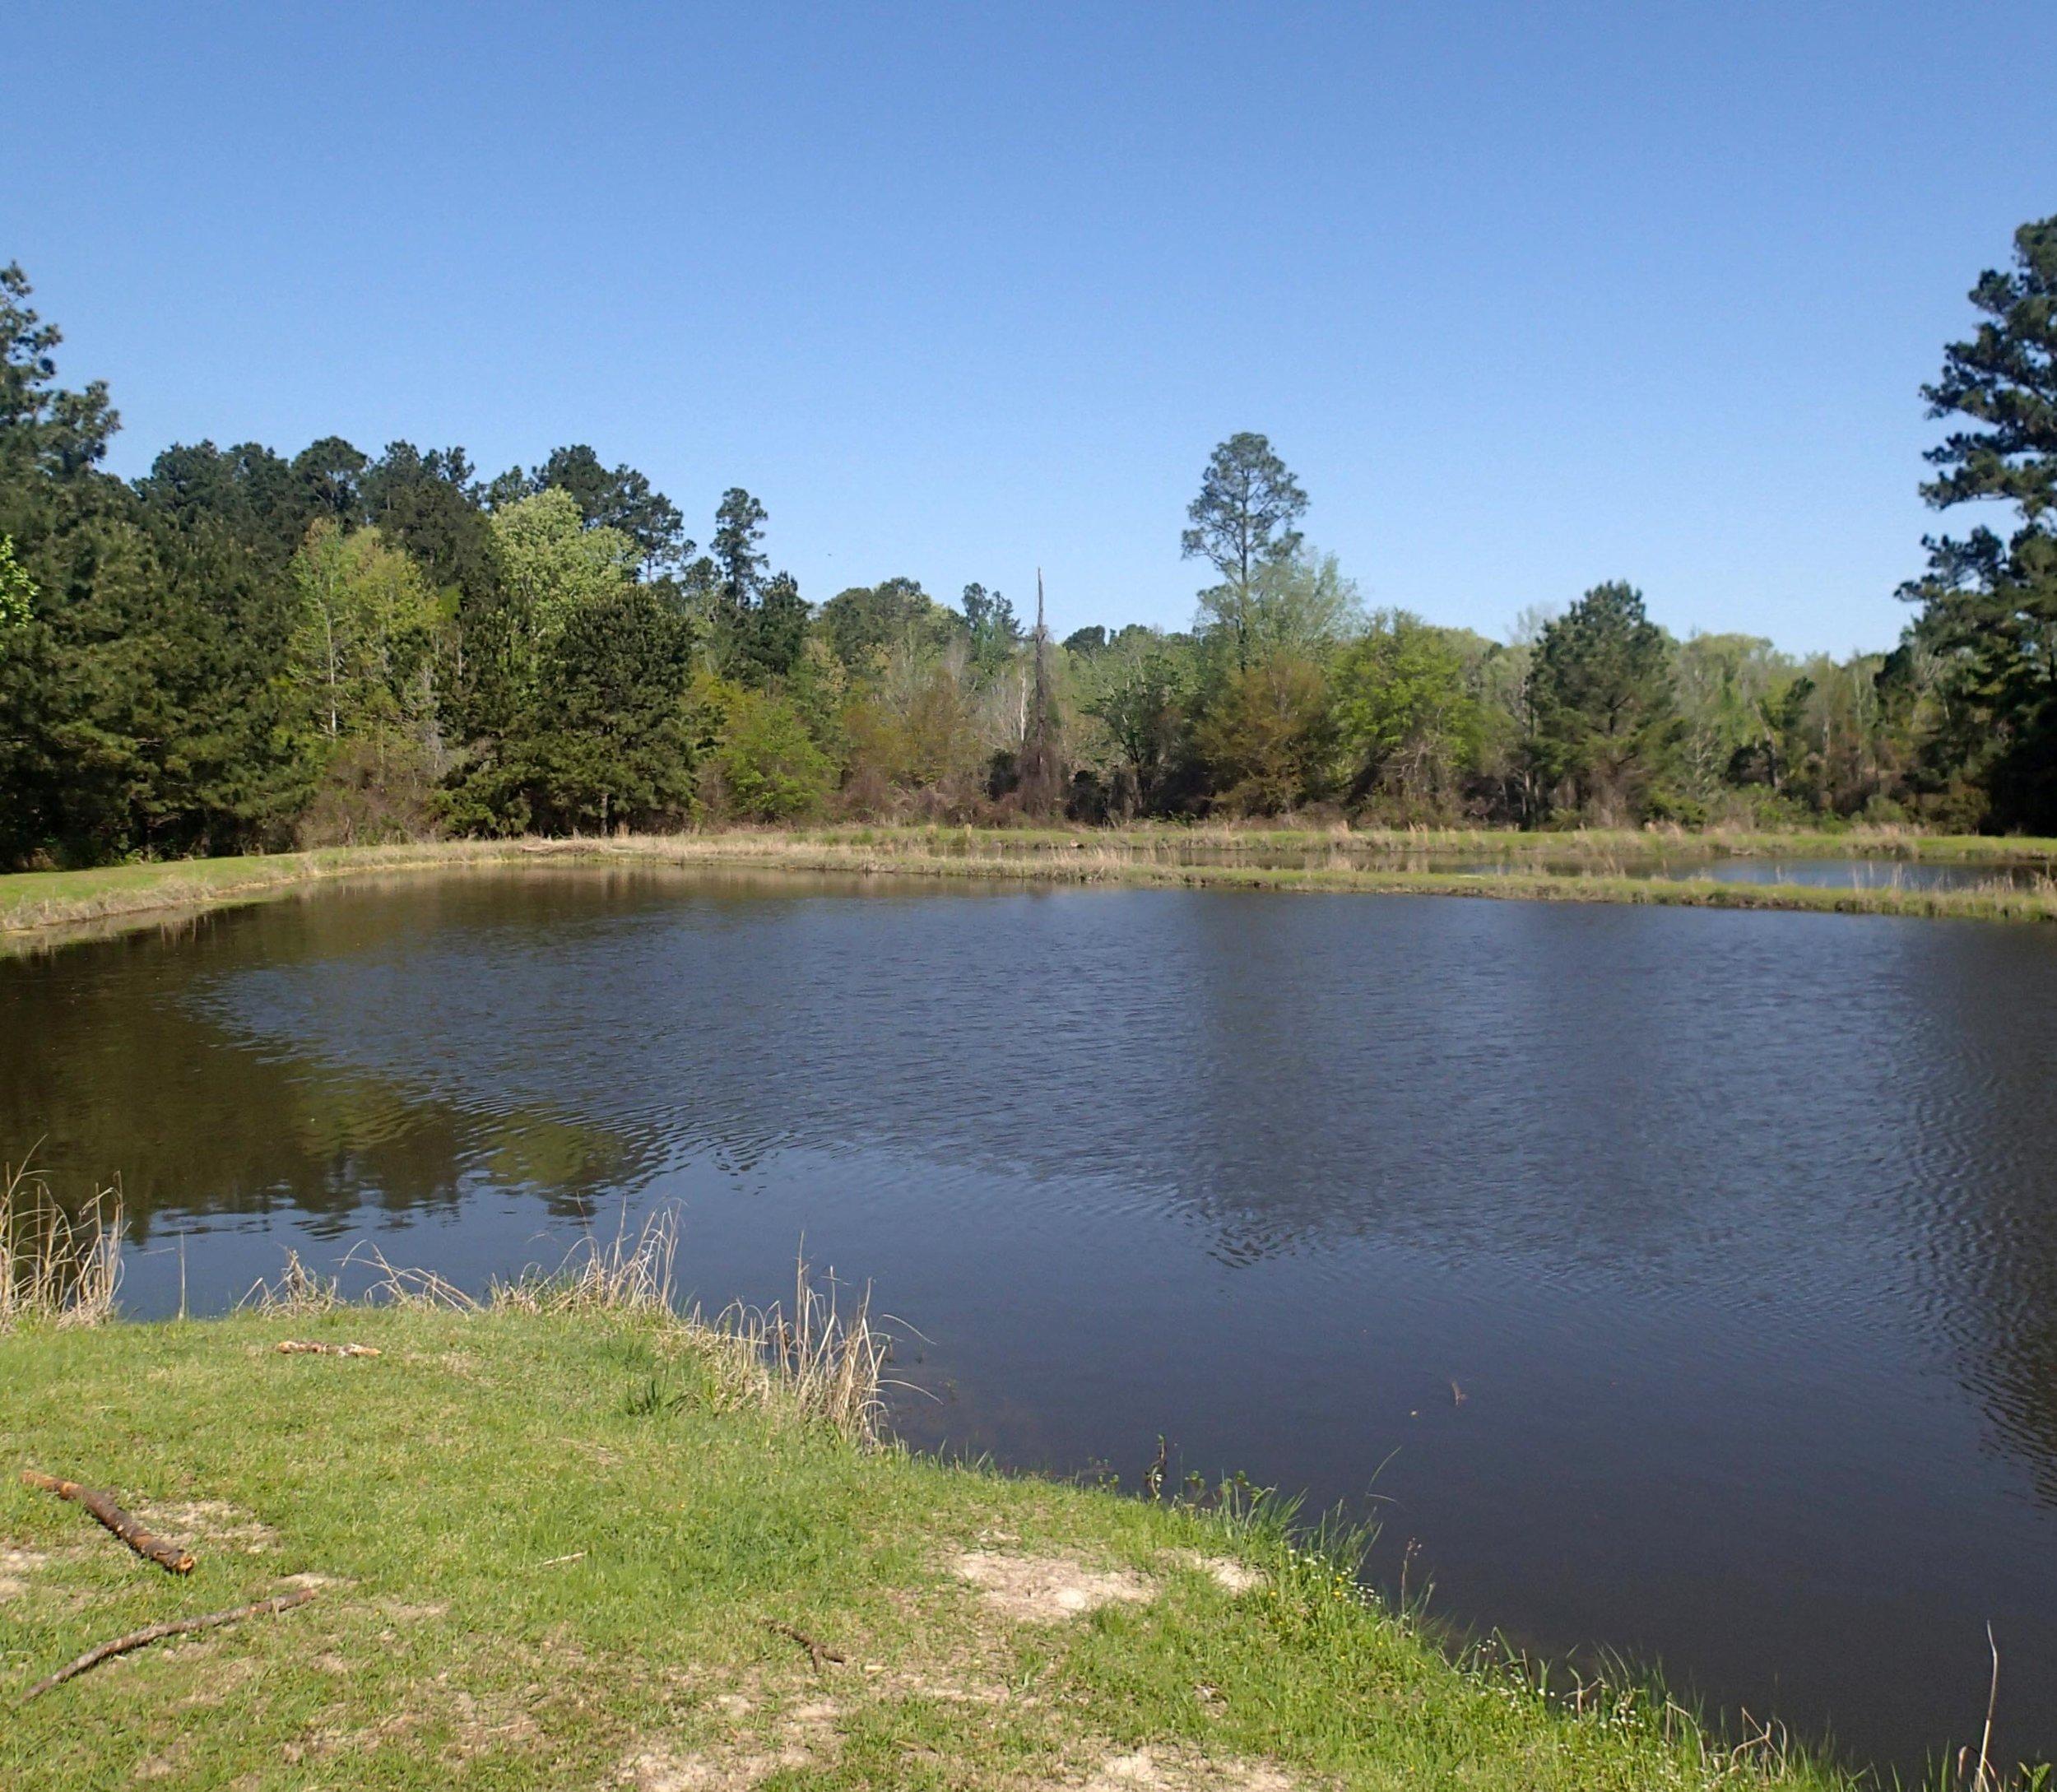 4-10-2014 Anderson Pond.jpg